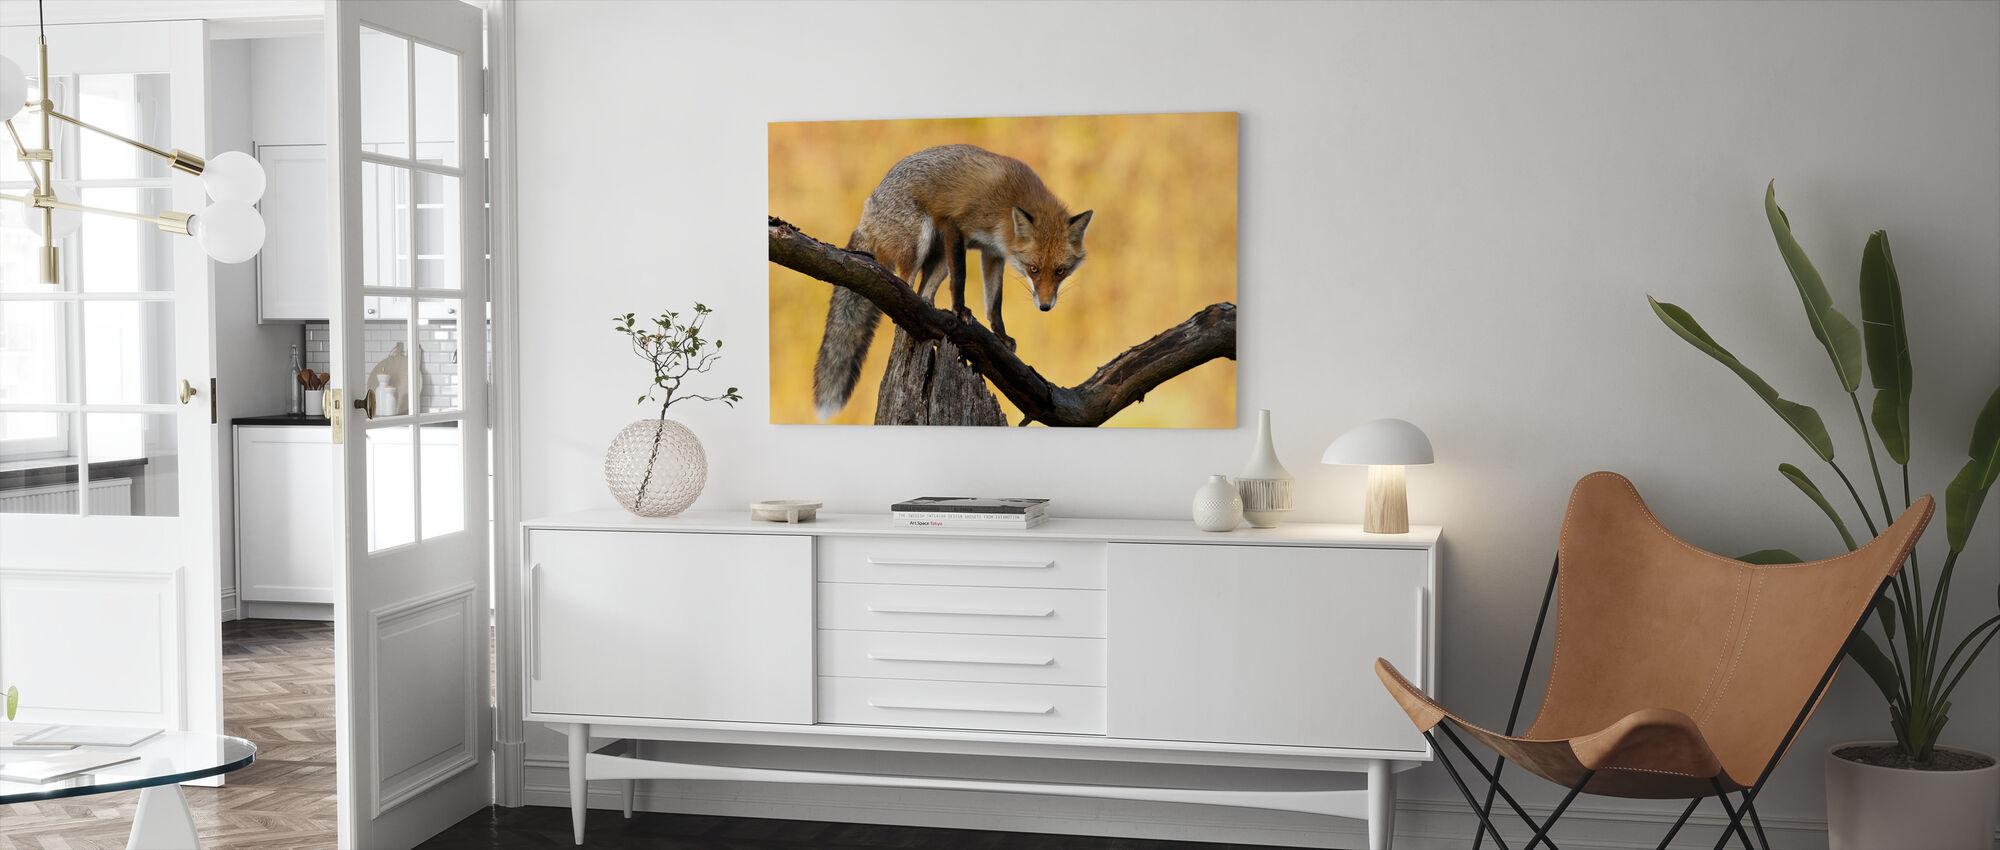 Fox with Blazing Eyes - Canvas print - Living Room